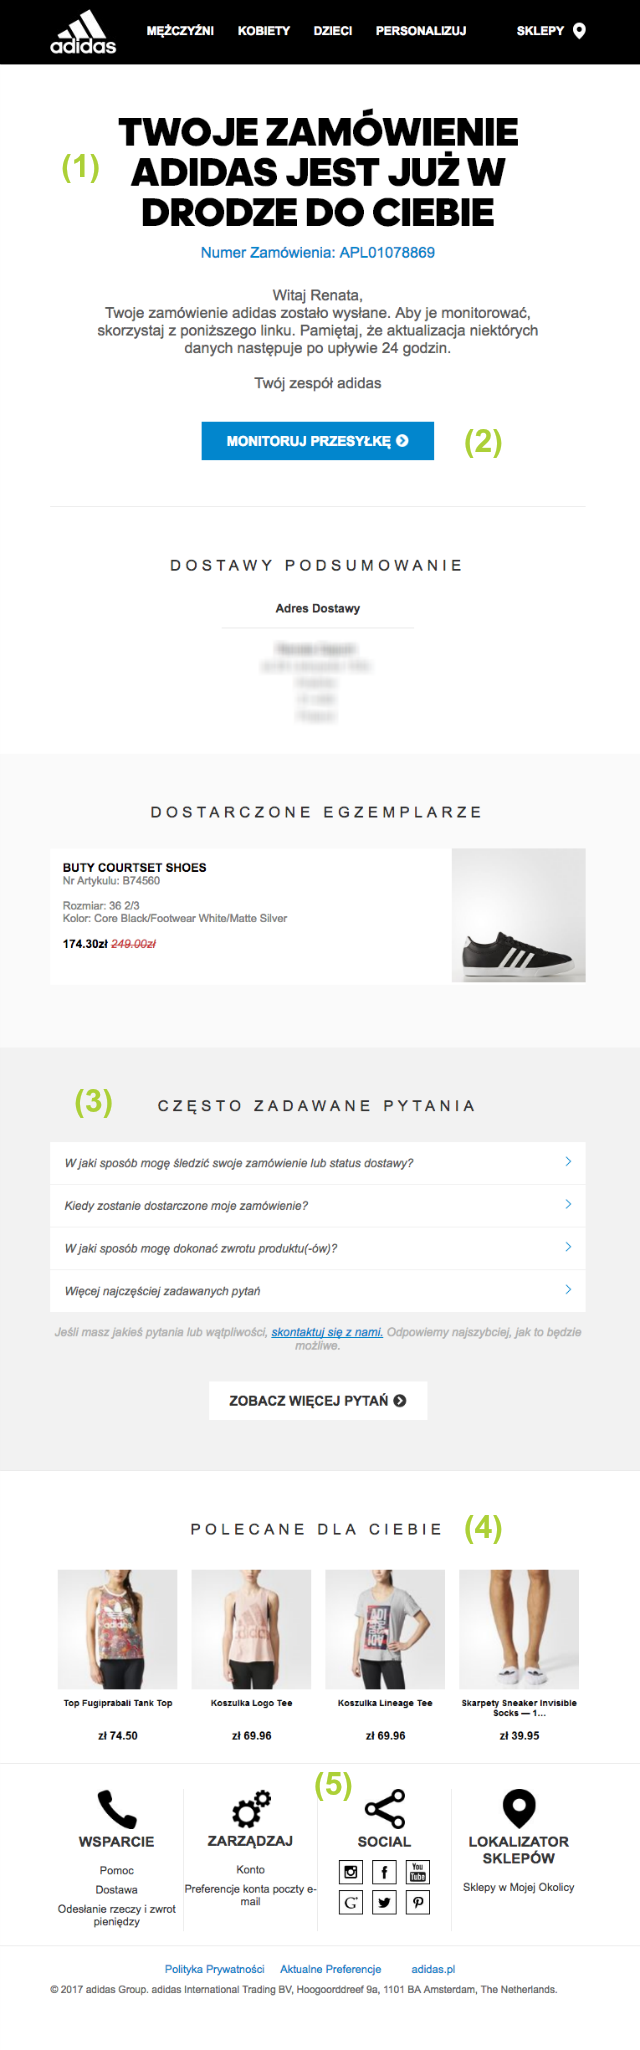 adidas-maile-transakcyjne-w-e-commerce